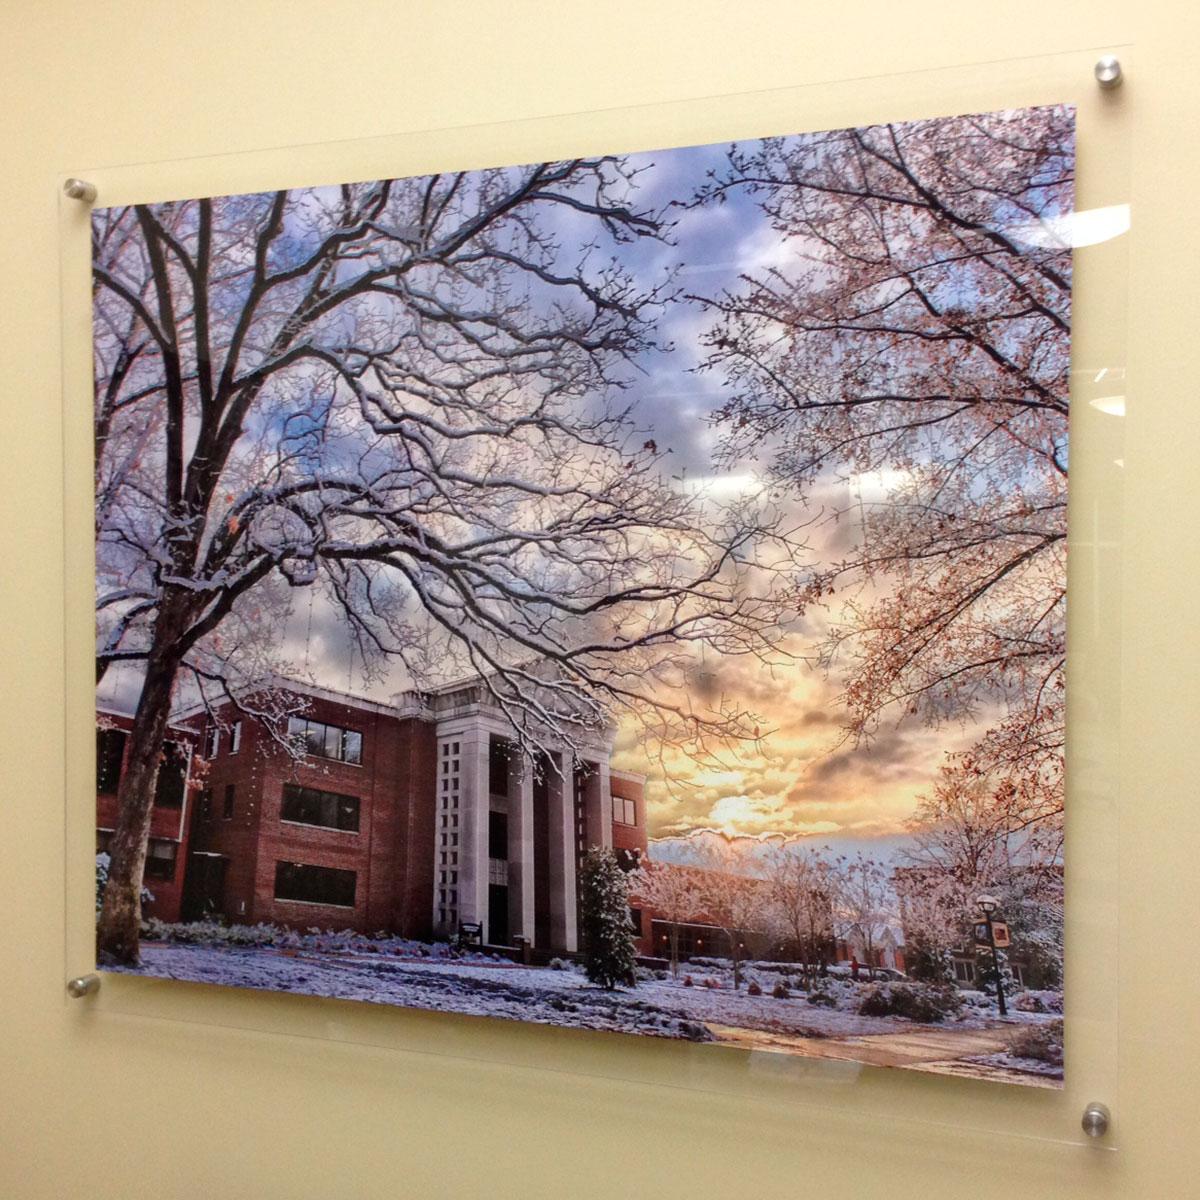 ArtisanHD direct to print acrylic print landscape photography